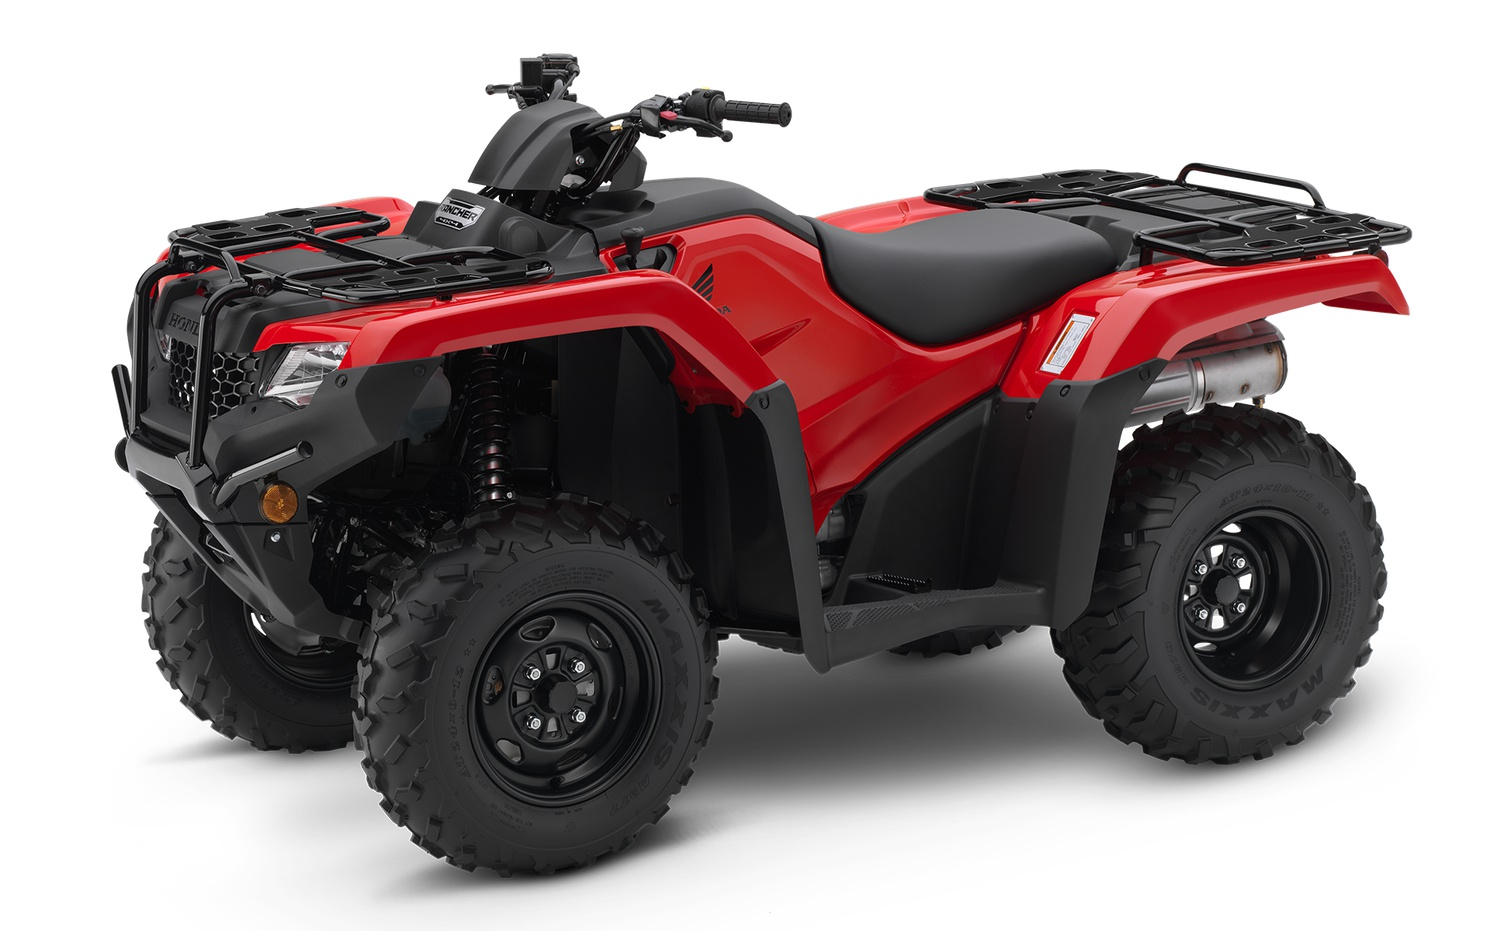 Honda TRX420 Rouge Patriote 2022